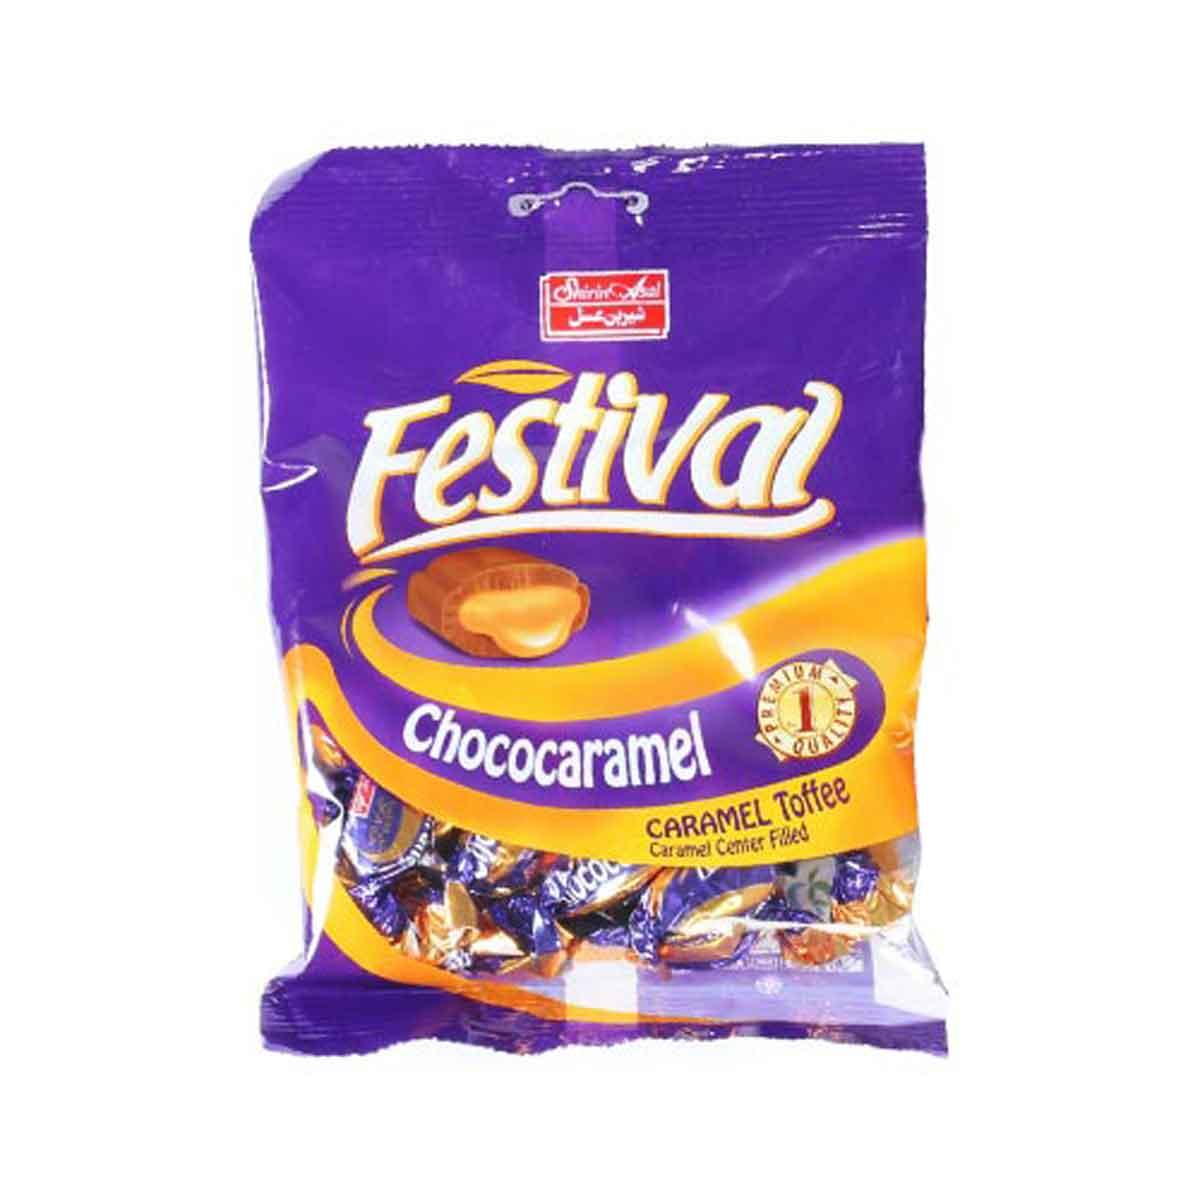 تافی کاکائوبامغزی کارامل فستیوال شیرین عسل